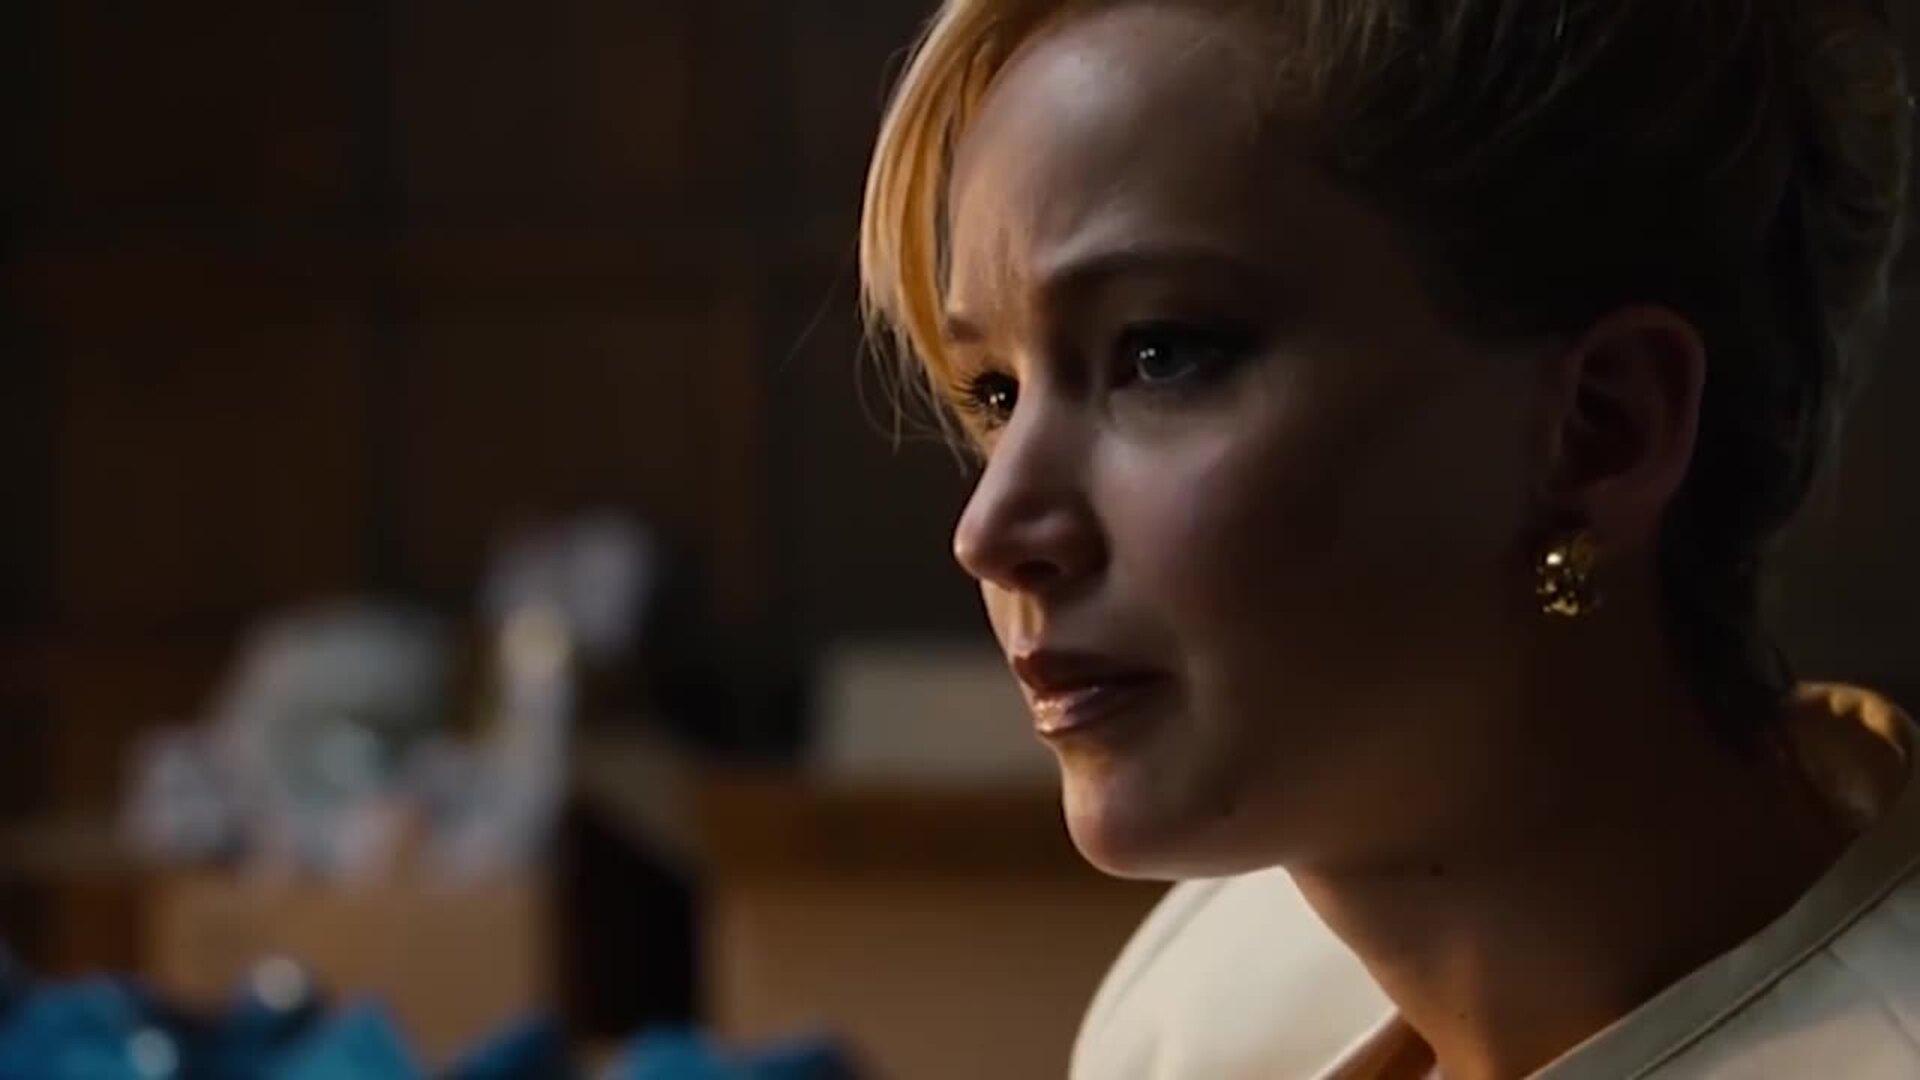 Jennifer Lawrence pasará por el altar este fin de semana